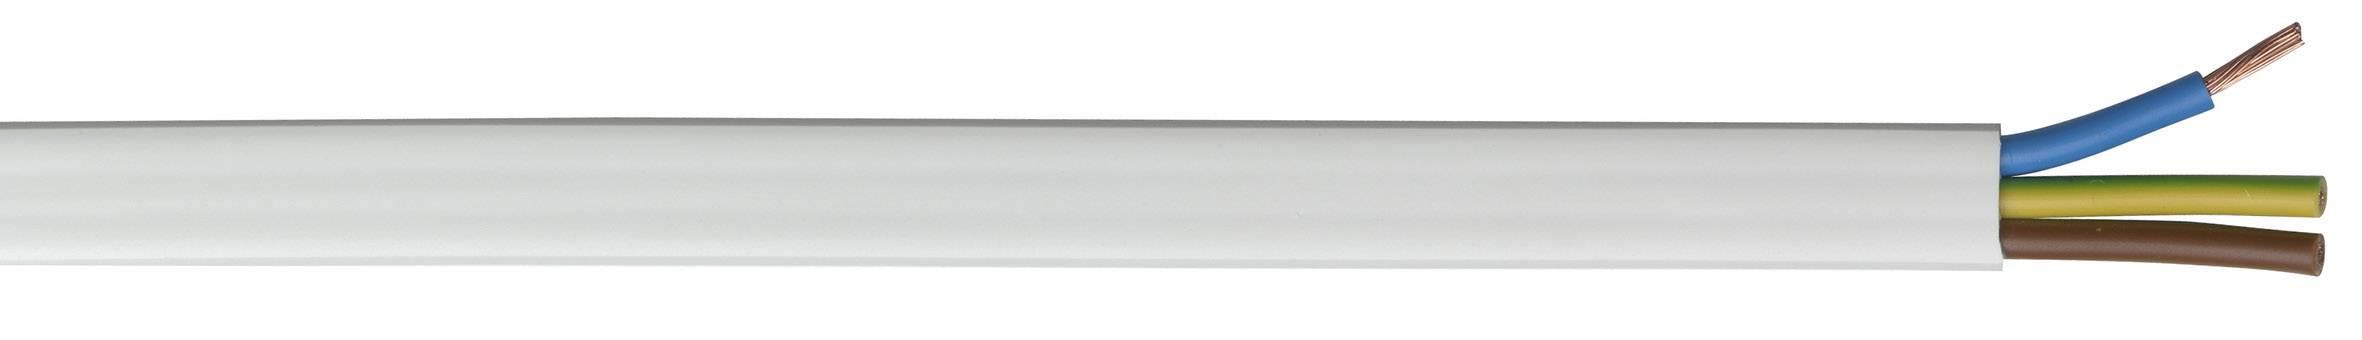 Plochý inštalačný kábel S05VVH2-F TRU COMPONENTS 3038642/500, 3 x 1.50 mm², biela, metrový tovar